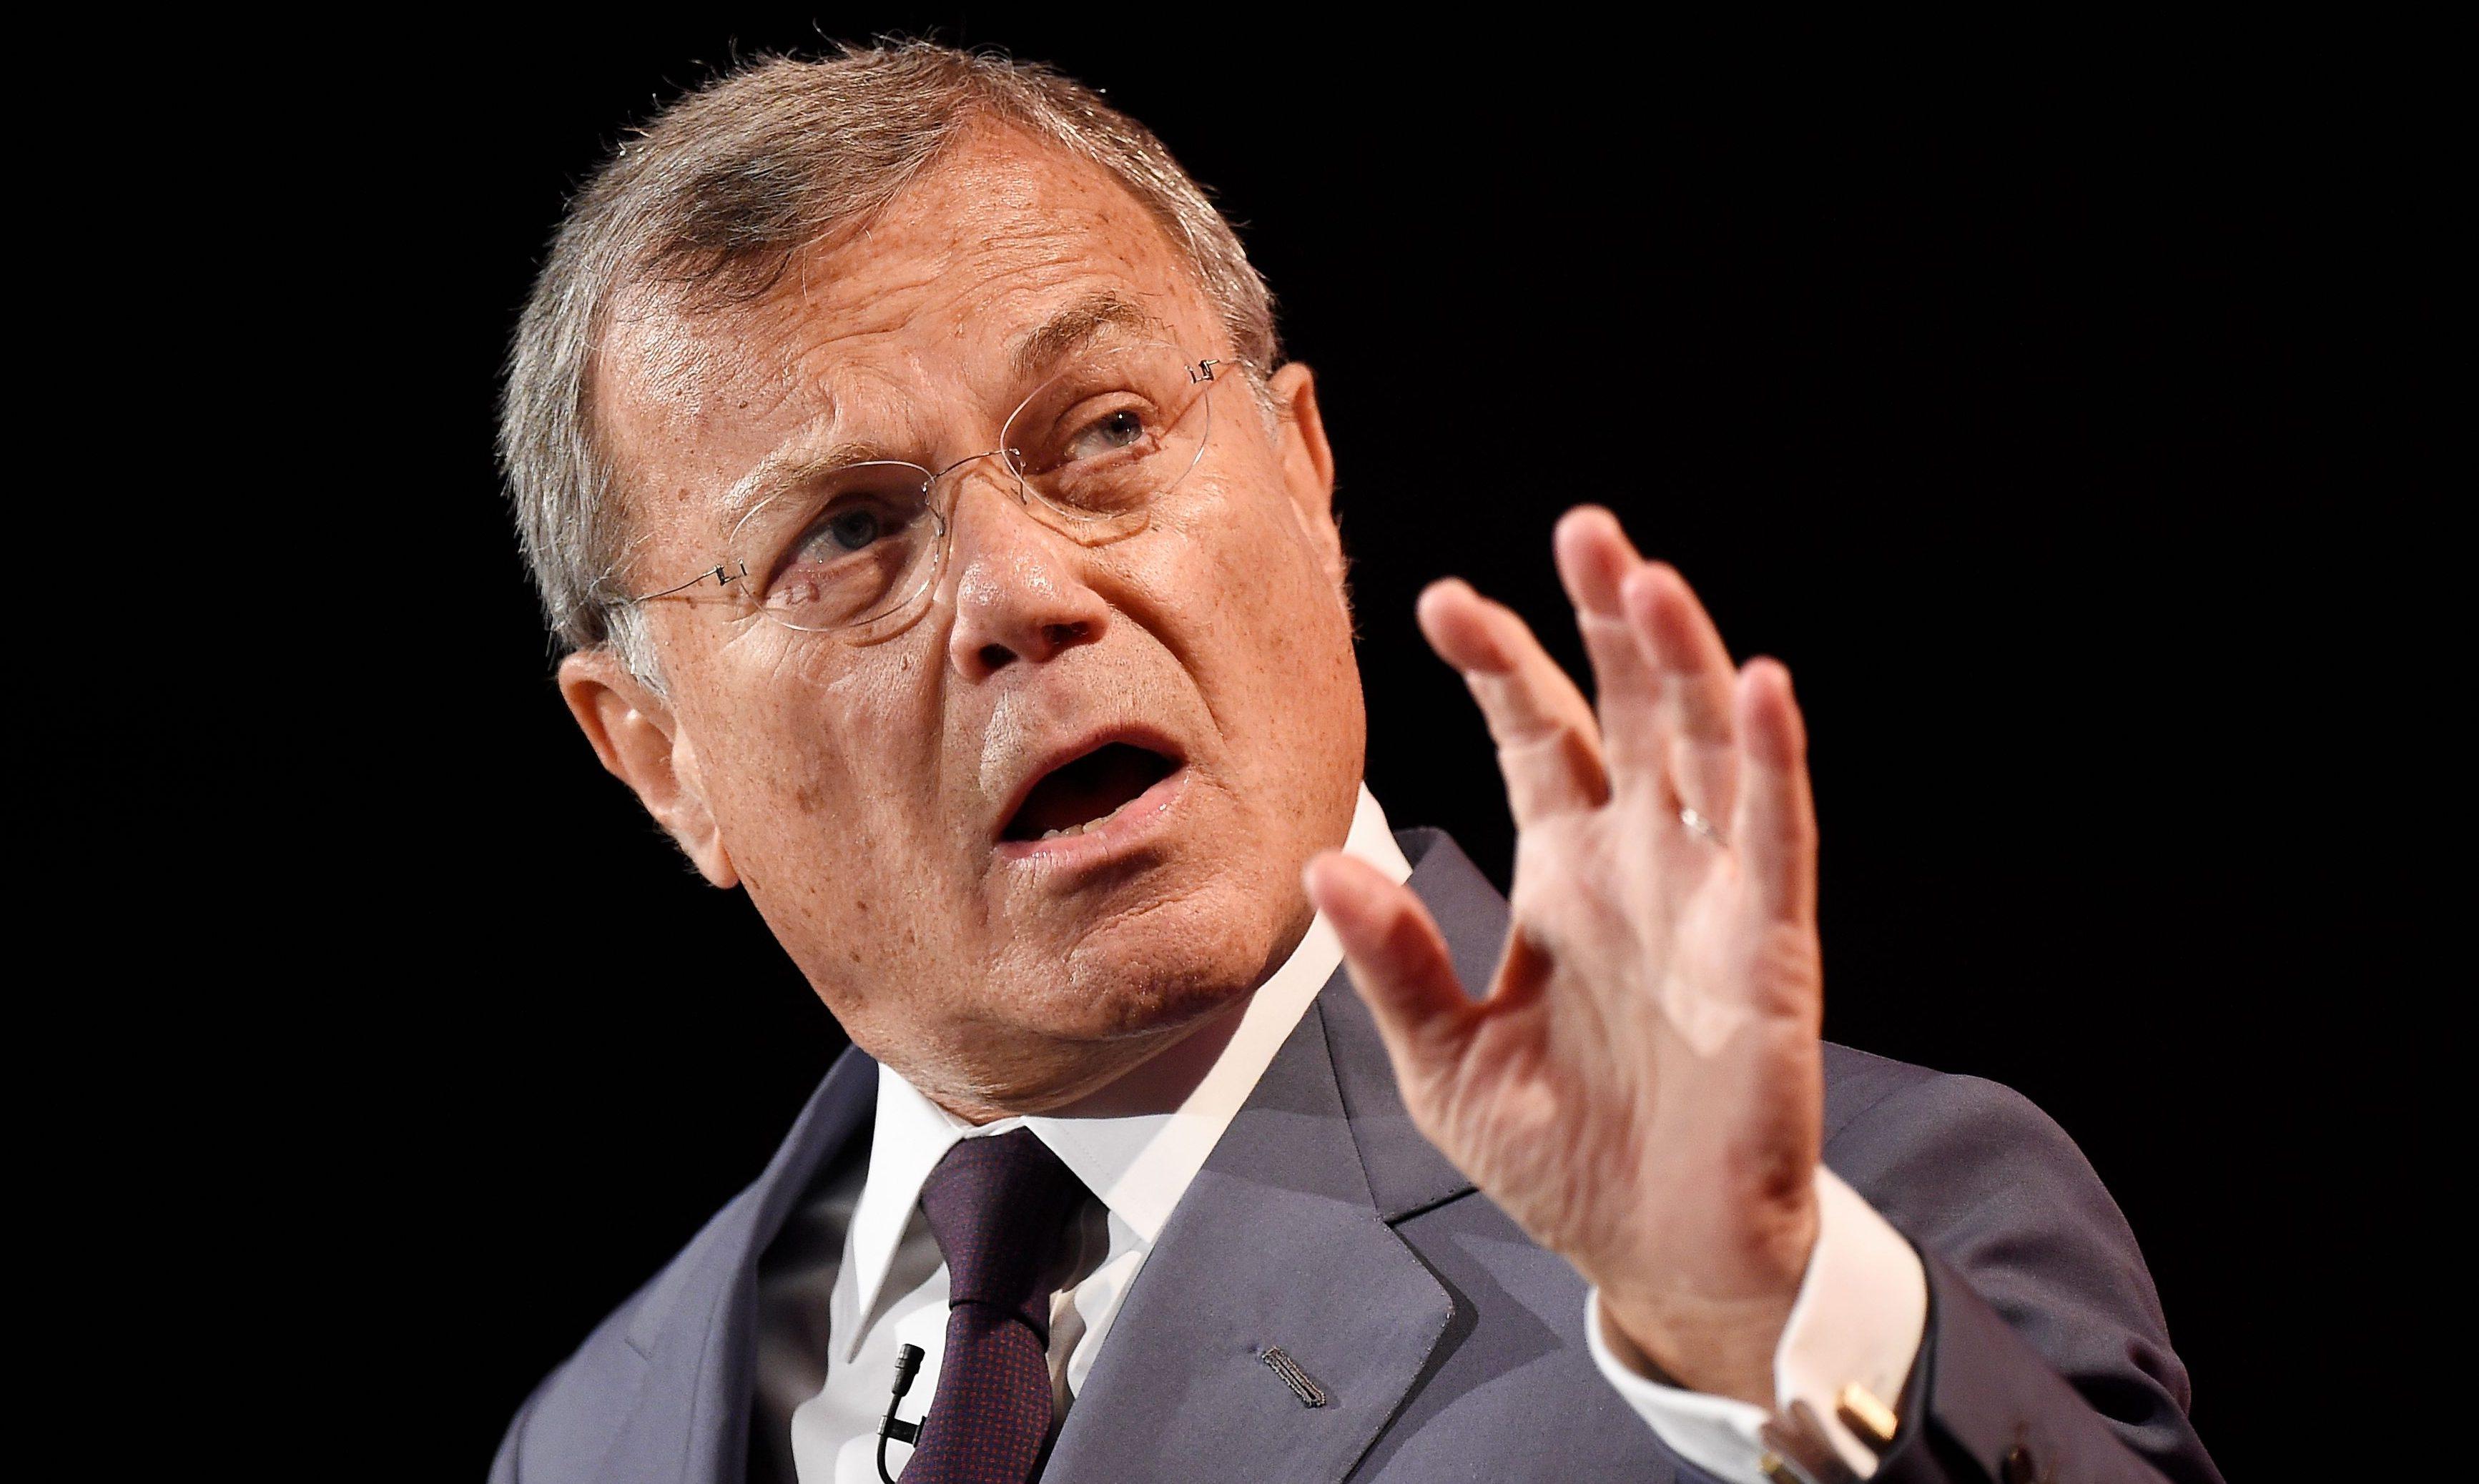 WPP CEO Sir Martin Sorrell resignation